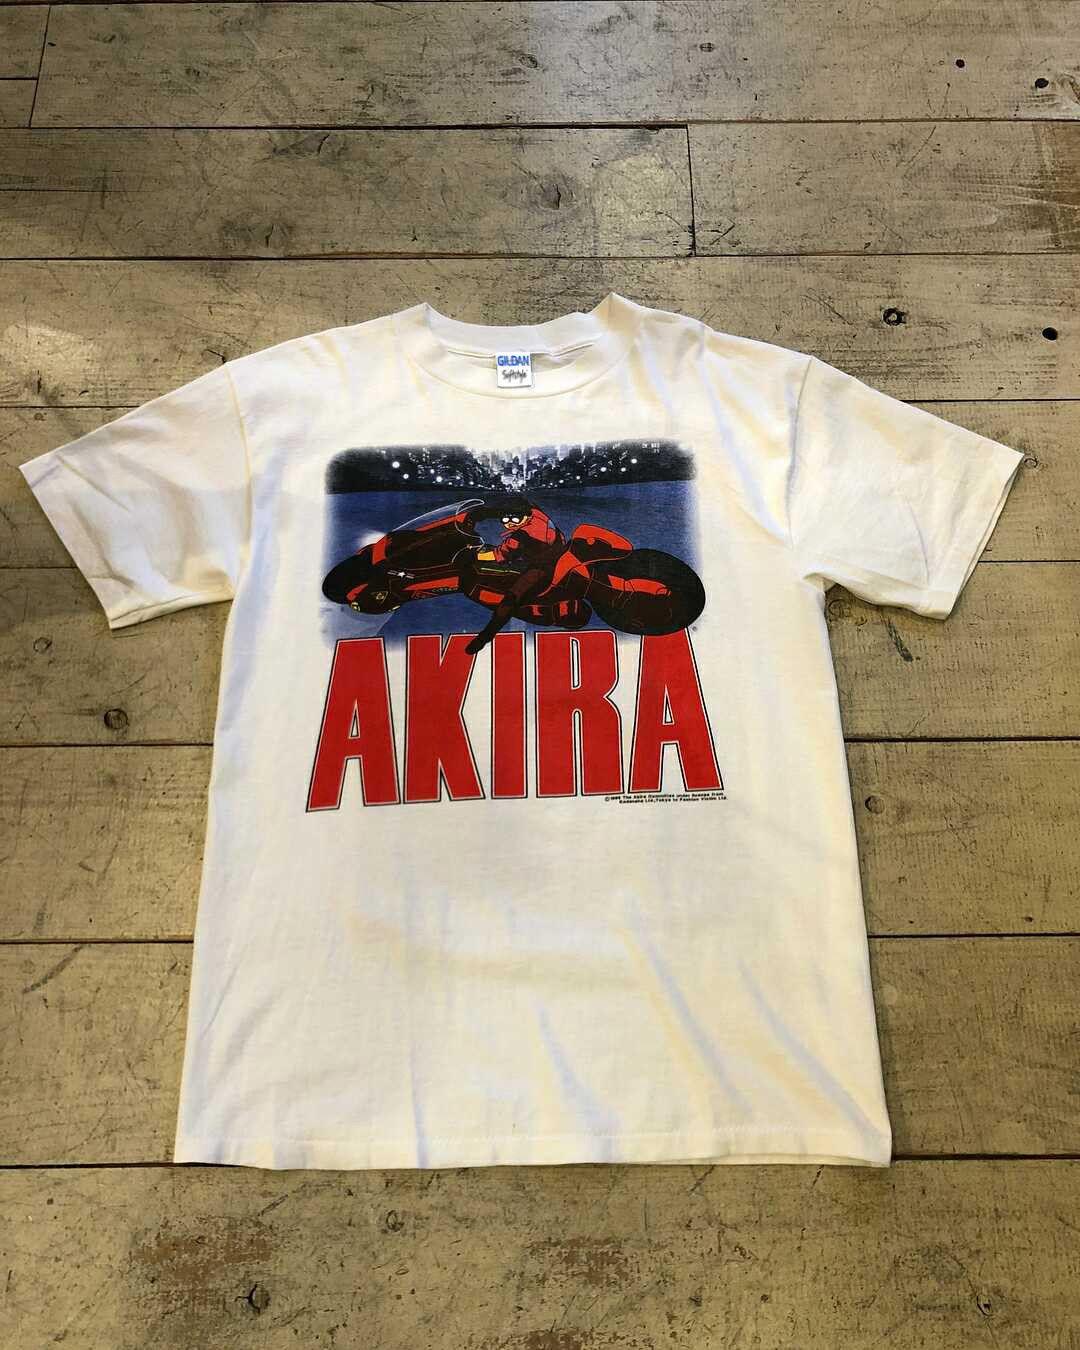 c63b6b50863 Vintage 80s 1988 AKIRA Anime Japan Shirt Reprint Hoodie Hip Hop T Shirt  Cheap Tee Shirts Funny Tees From Docup